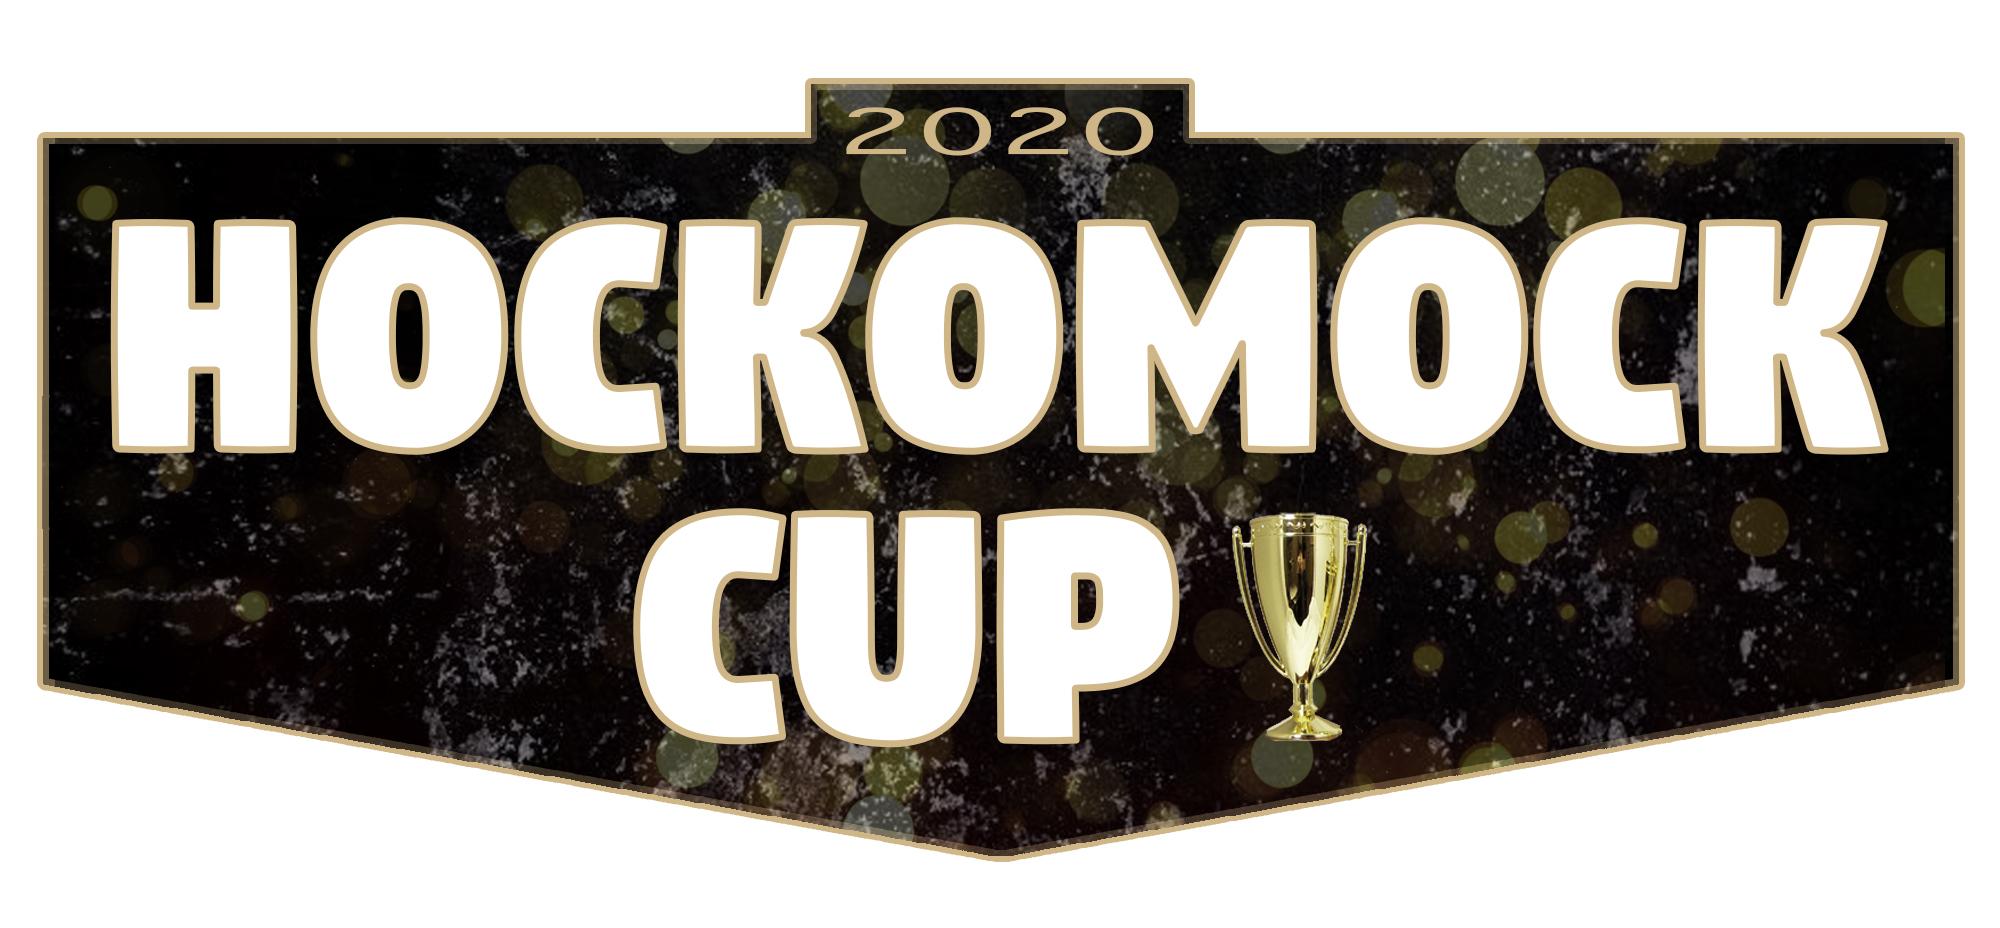 2020 Hockomock Cup